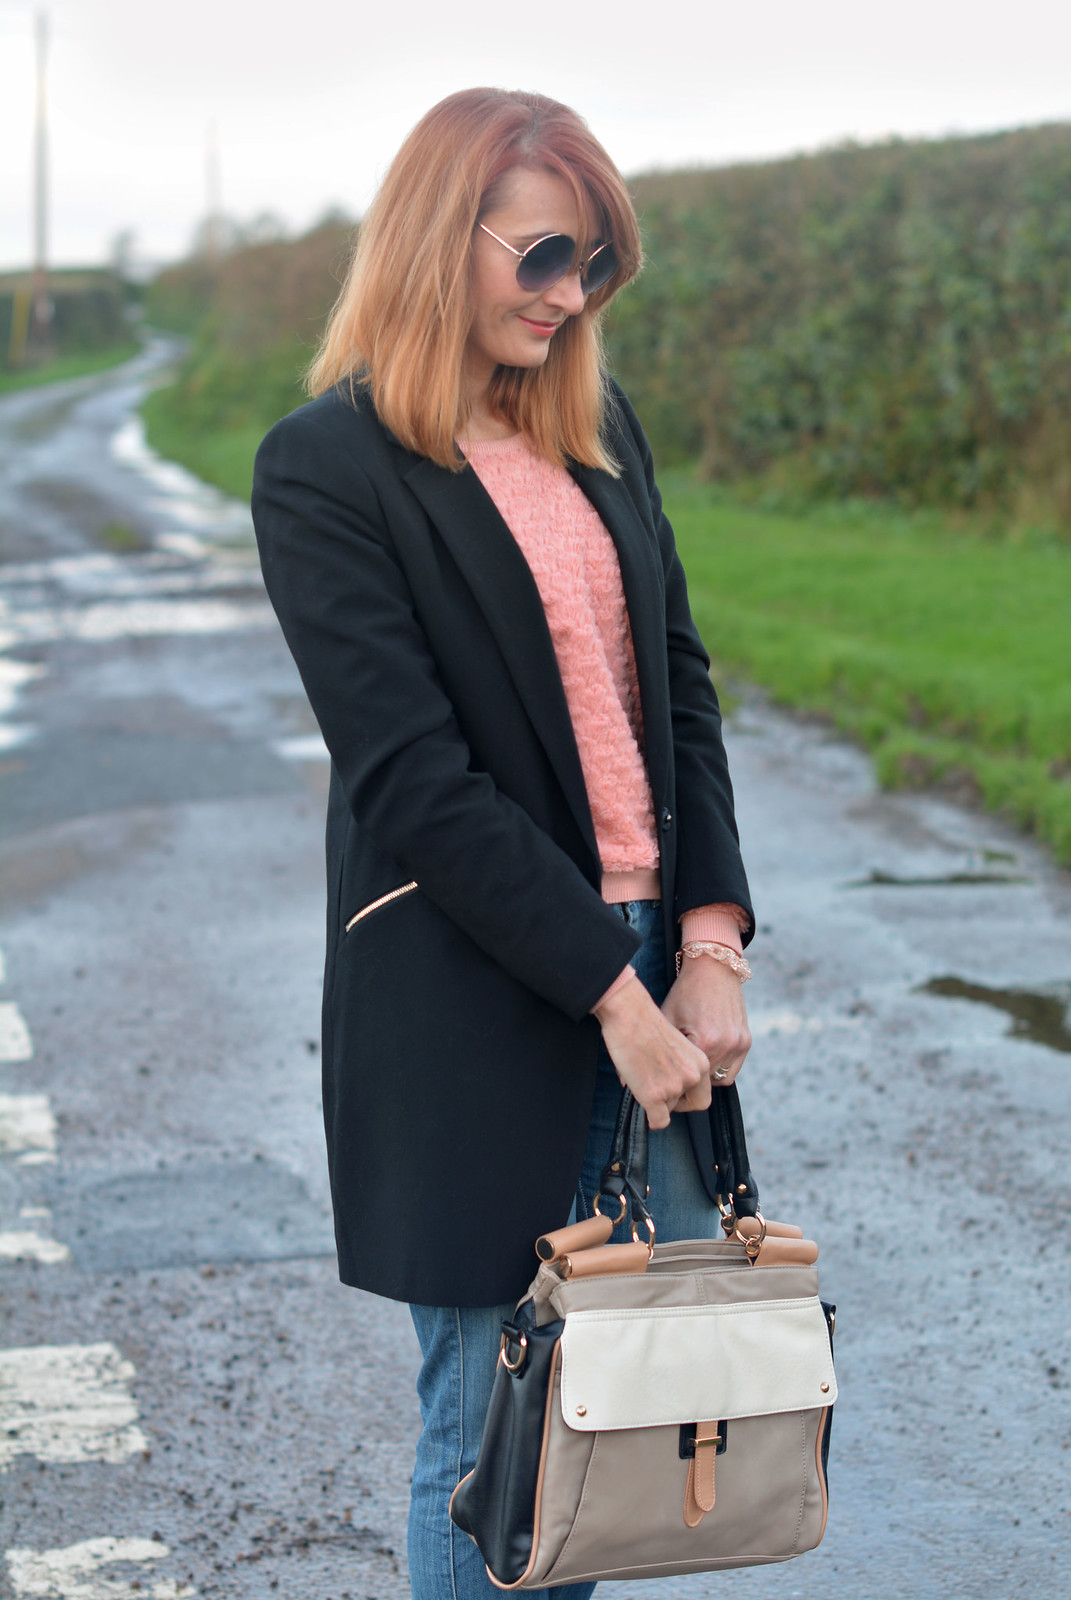 Longline black blazer, boyfriend jeans, colourblock bag